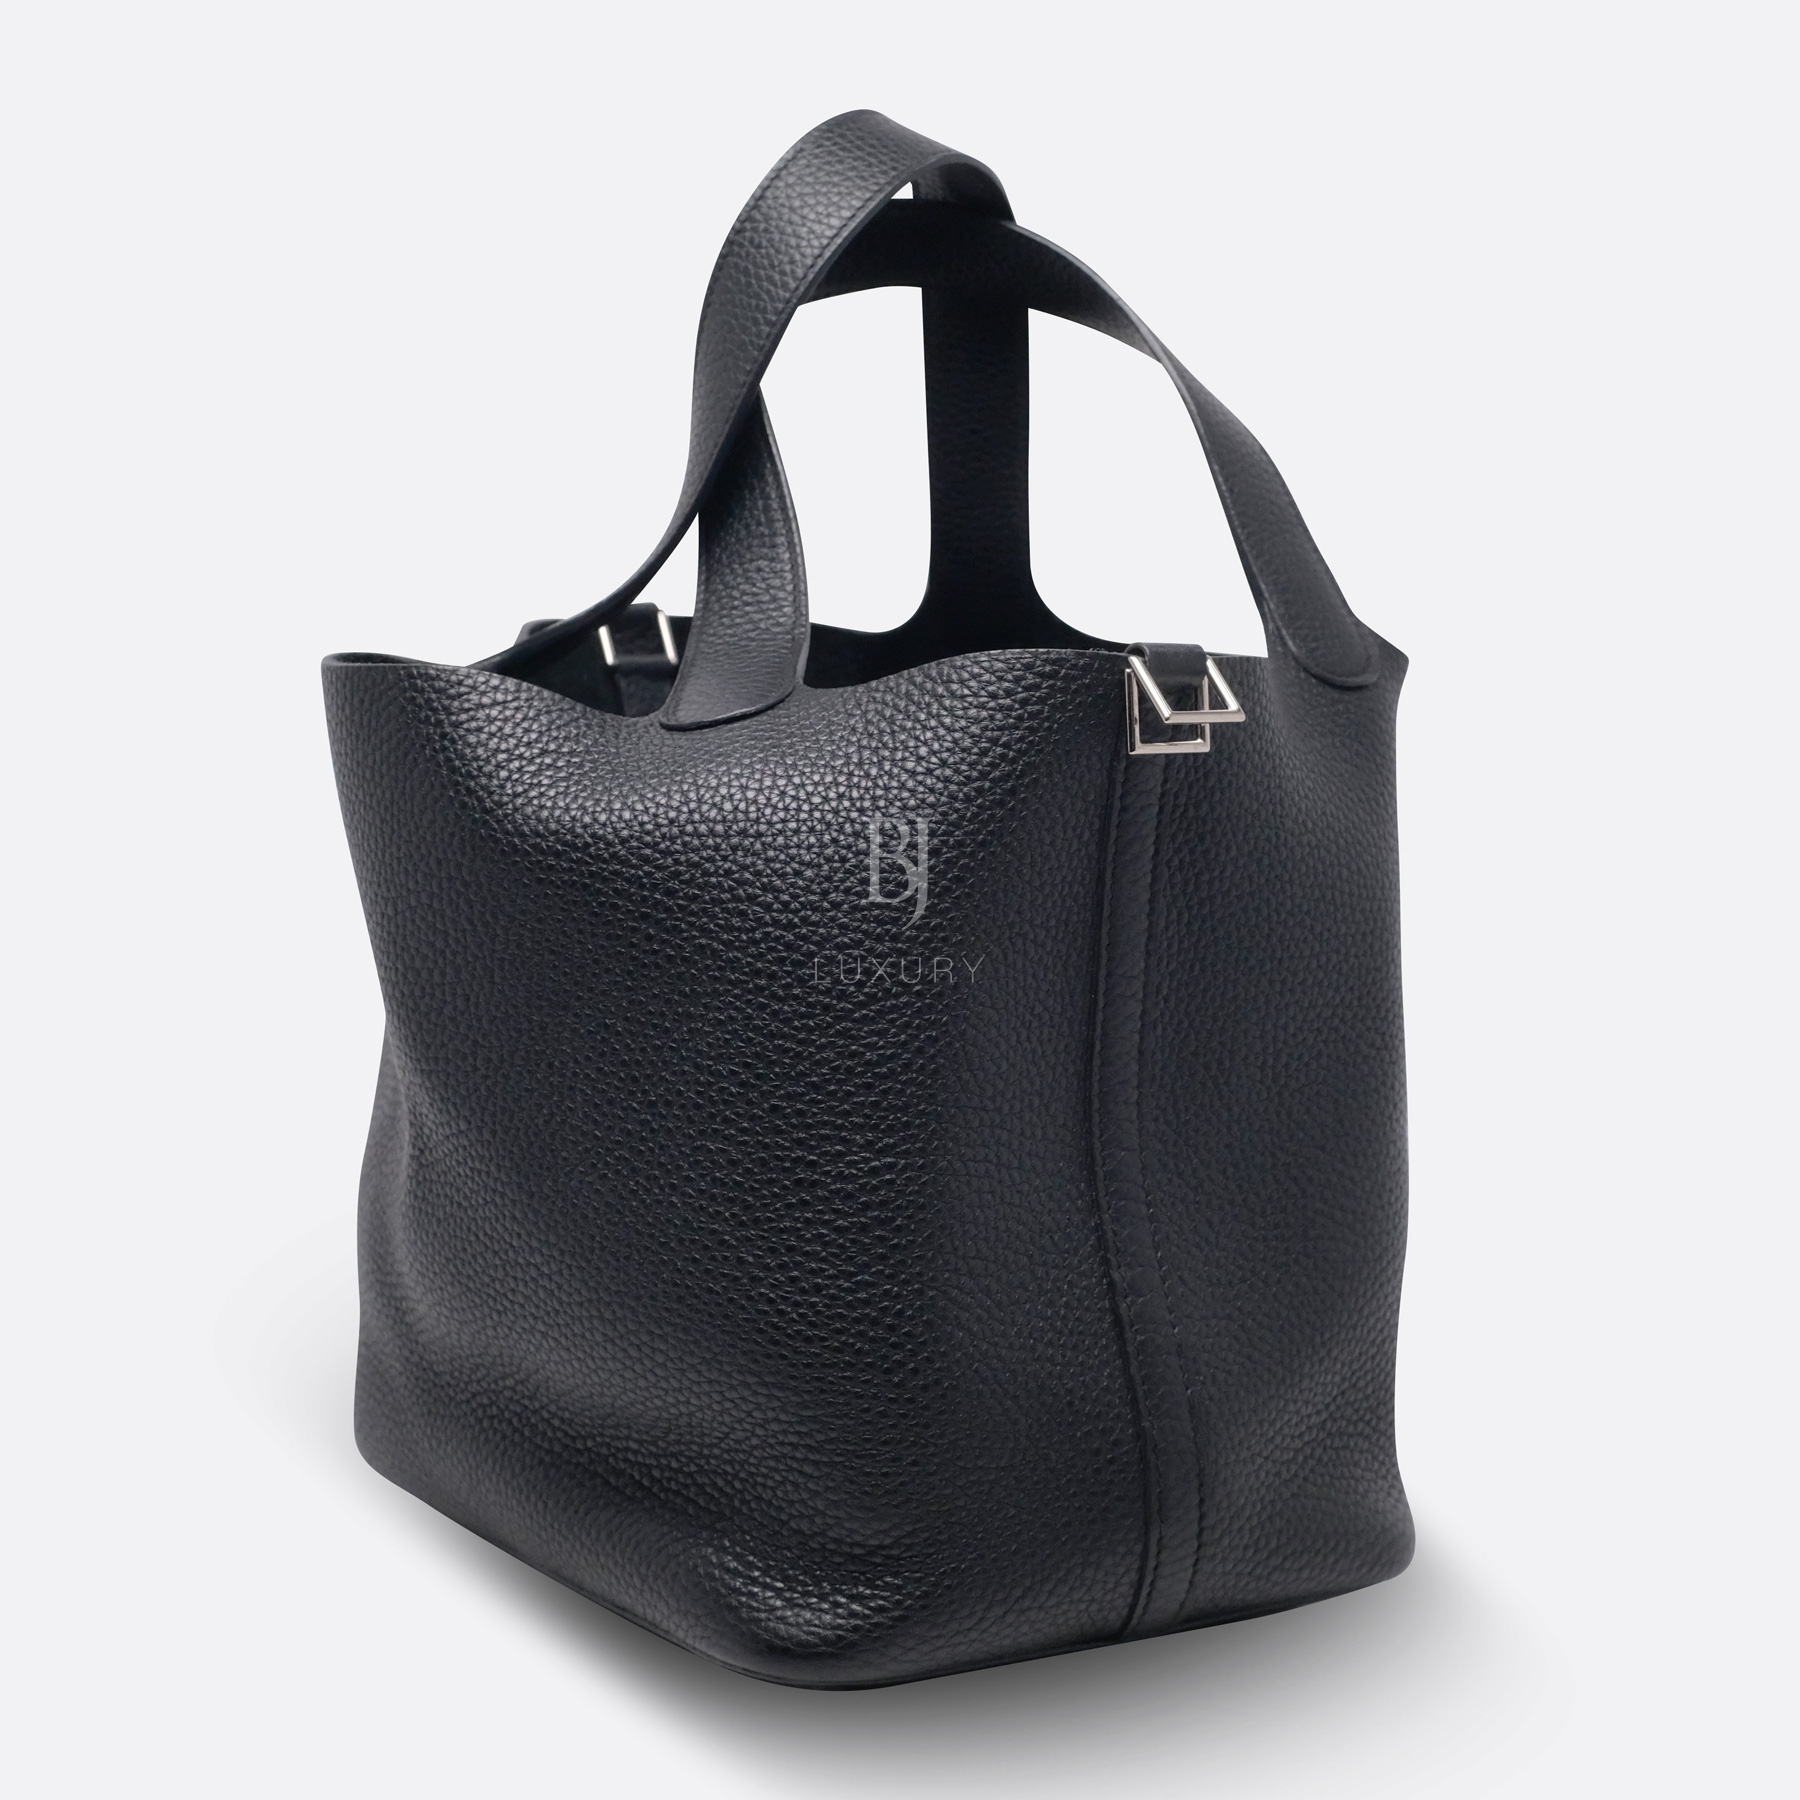 Hermes Picotin 22 Palladium Clemence BJ Luxury 2.jpg